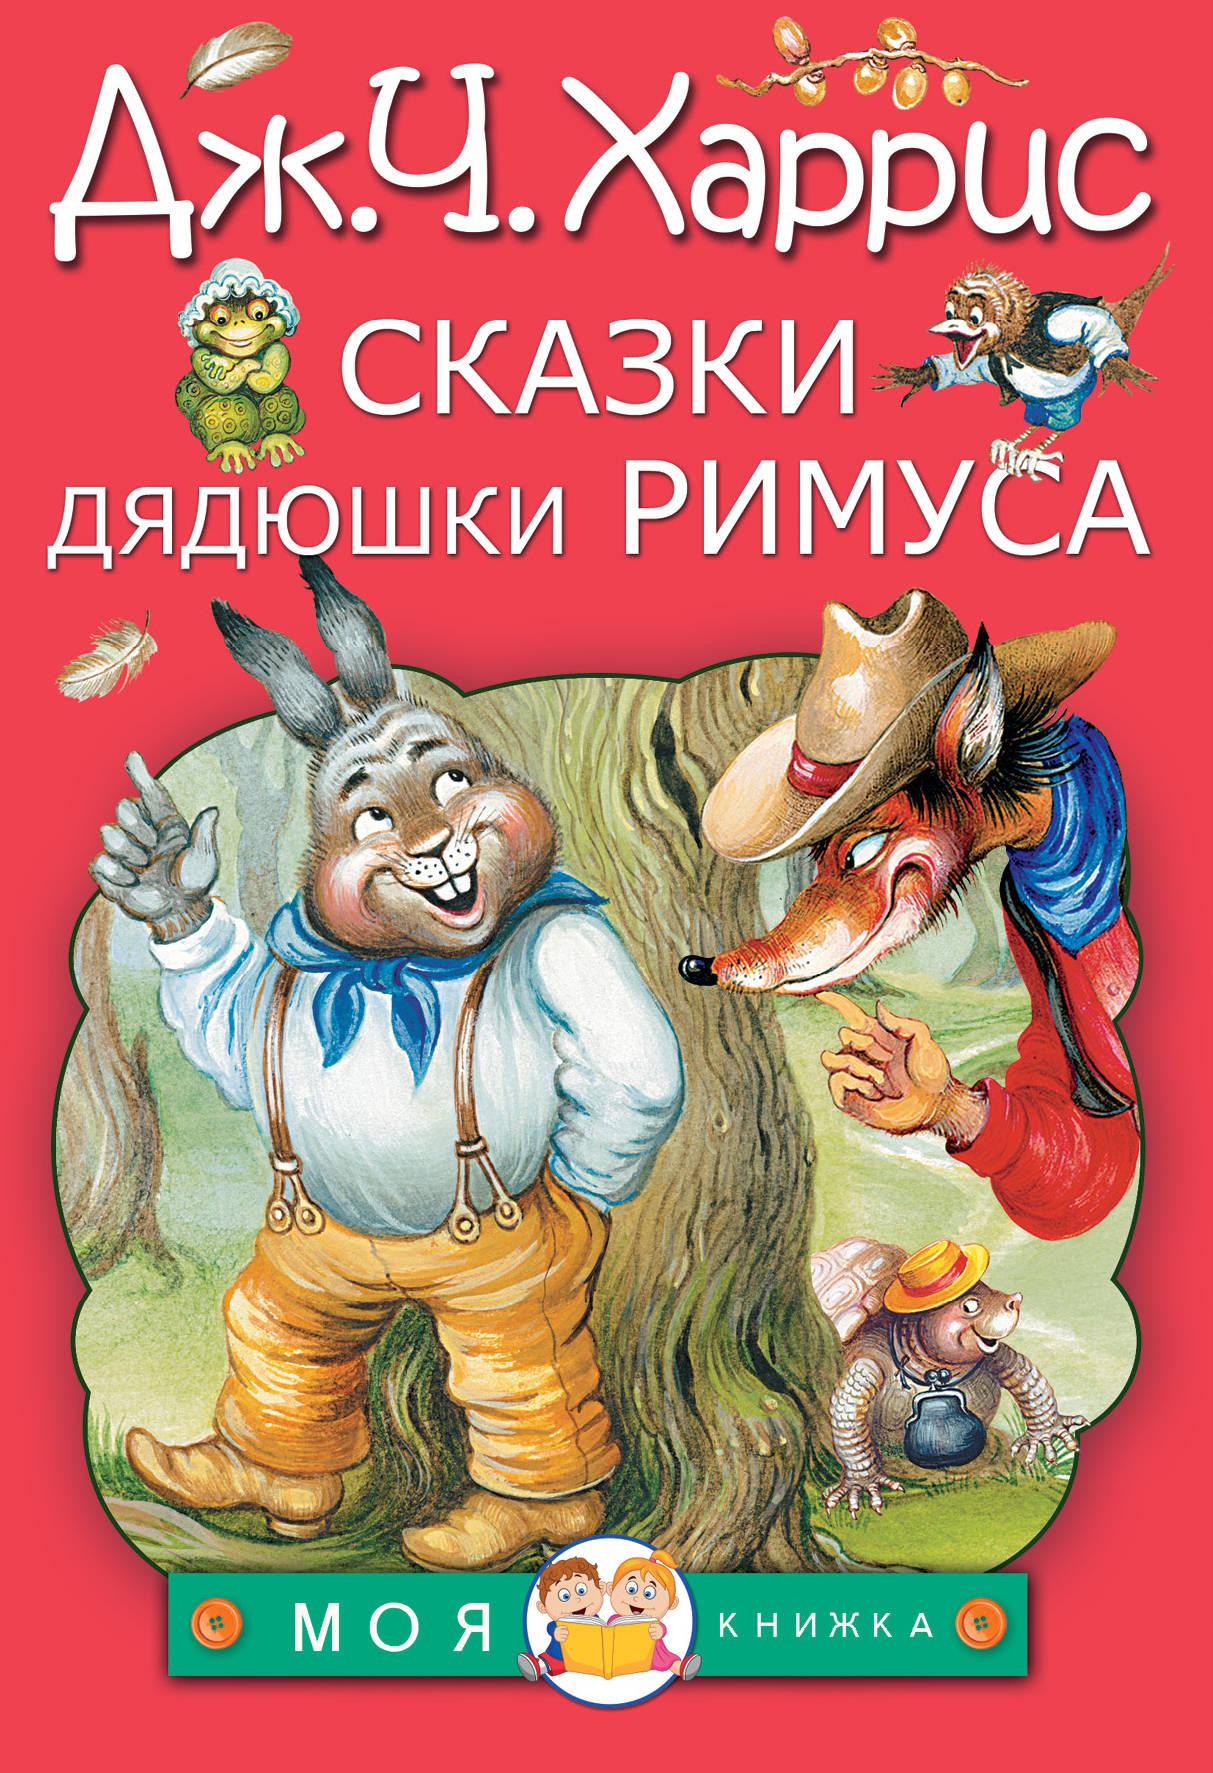 Харрис Джоэль Чандлер Сказки дядюшки Римуса сборник новые сказки дядюшки римуса